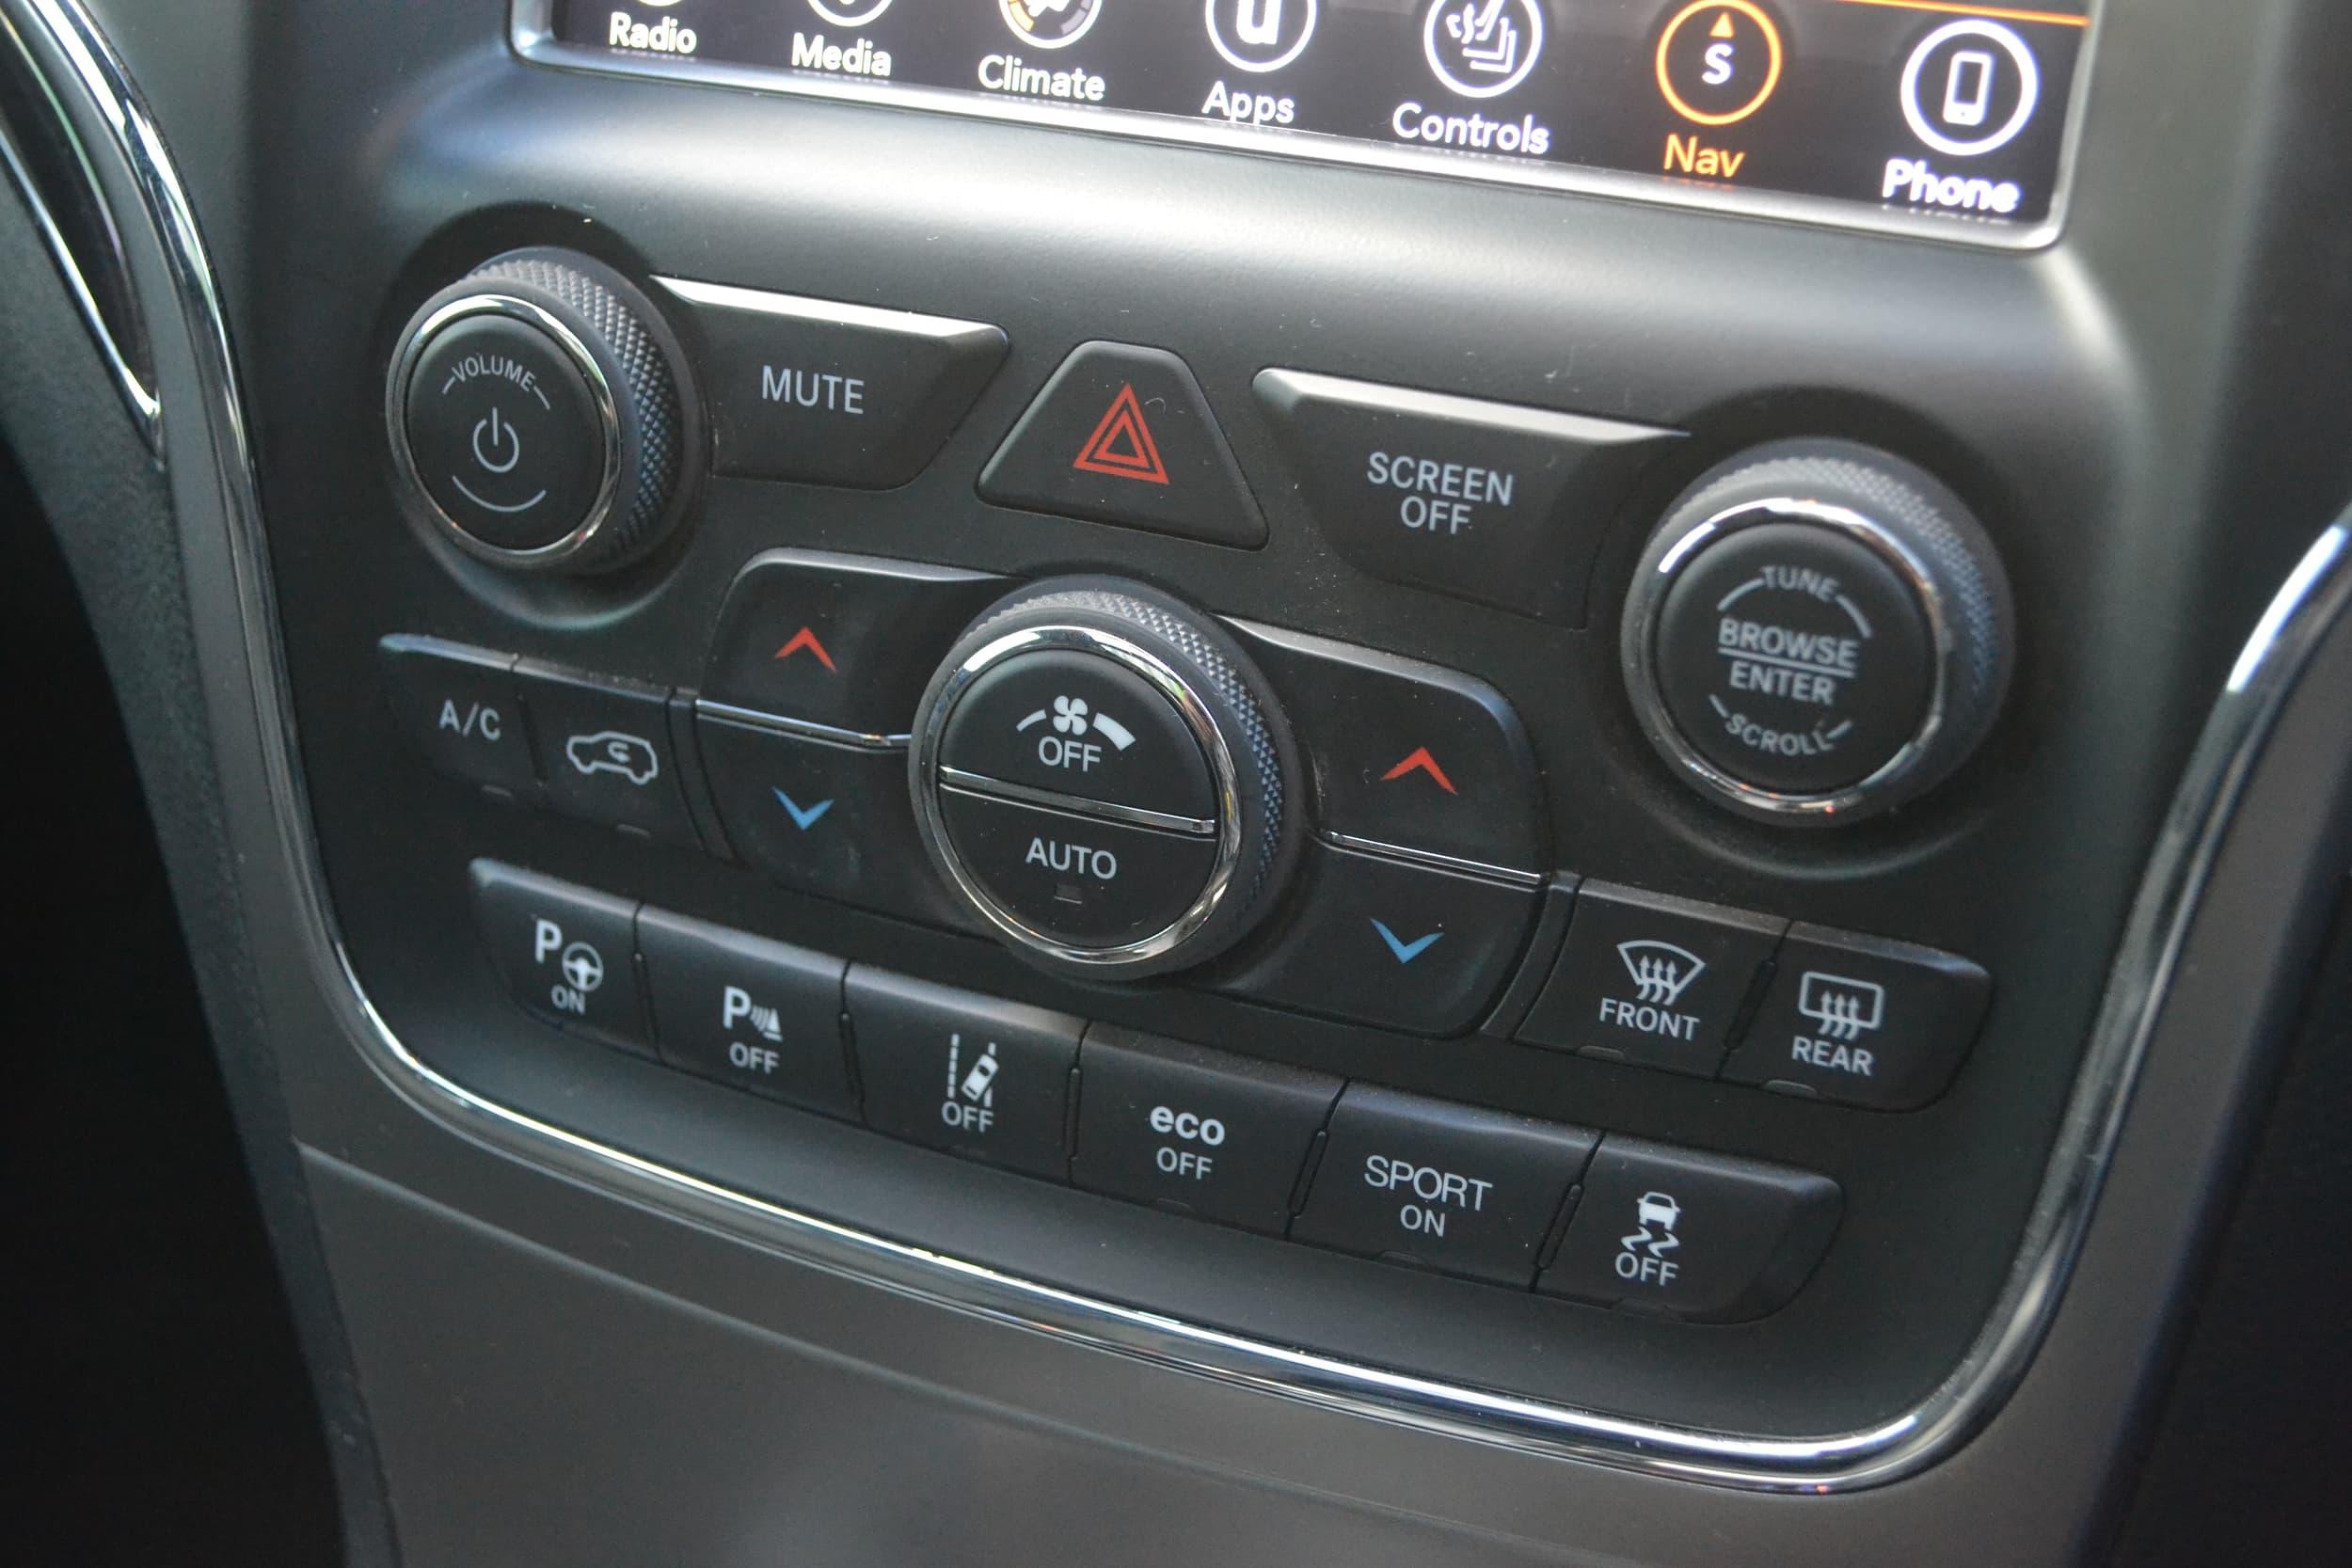 2018 Jeep Grand Cherokee Overland Auto 4x4 MY18 - image 17